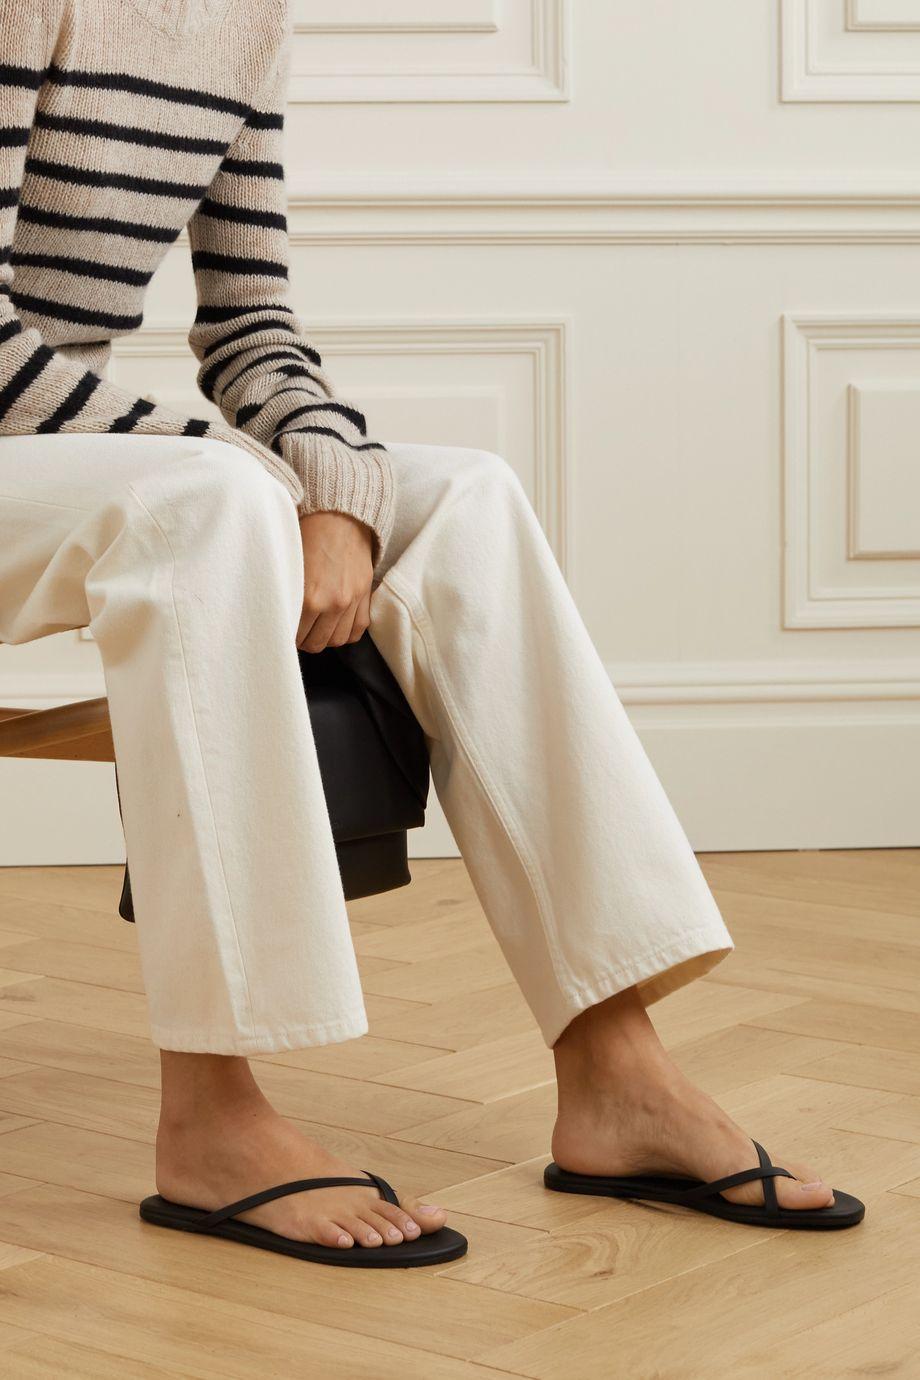 TKEES Riley matte-leather flip flops